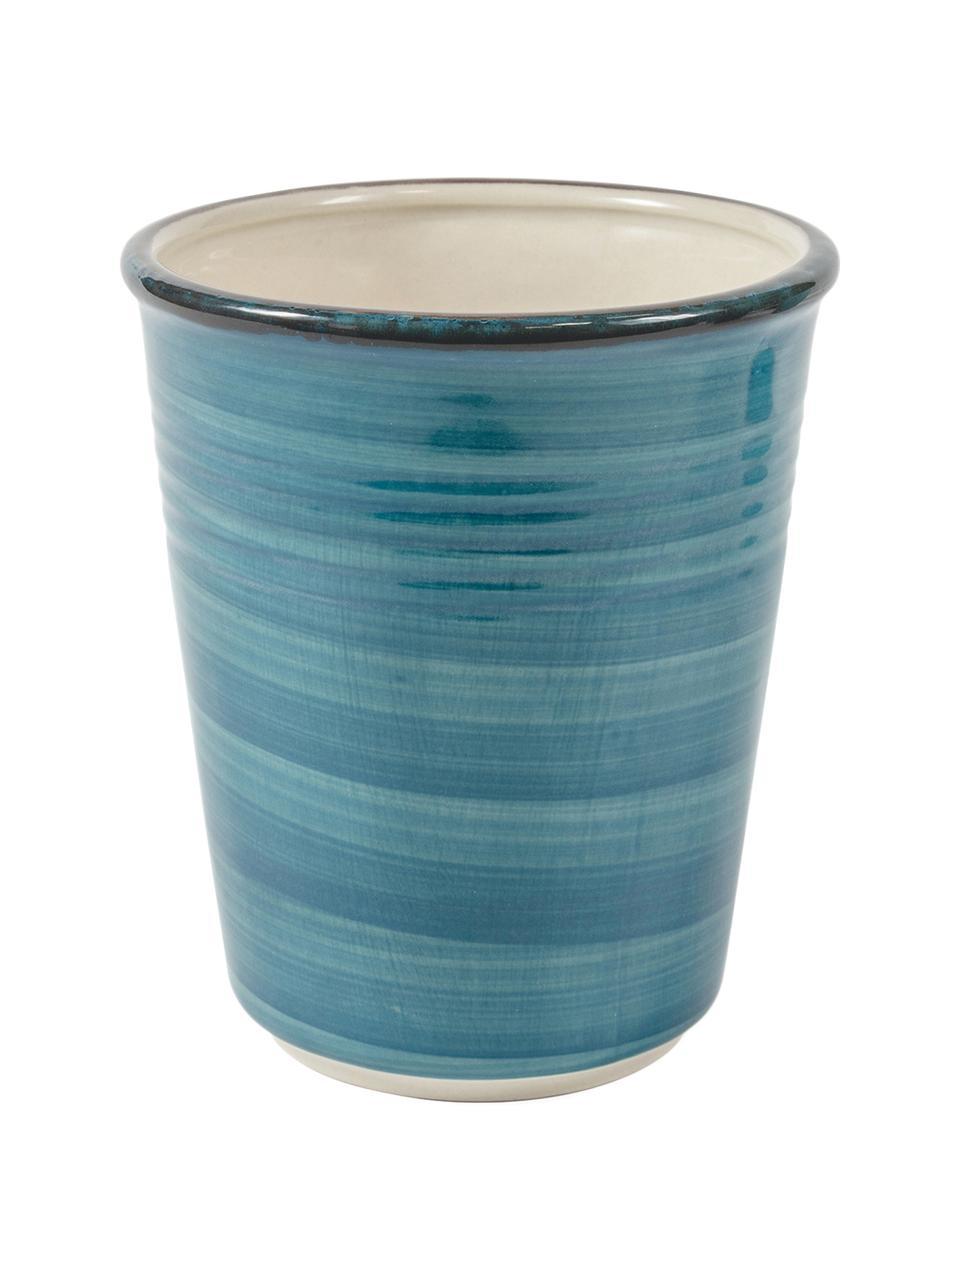 Set 6 tazze senza manico tonalità blu Baita, Gres (pietra dolomitica) dipinta a mano, Tonalità blu, Ø 9 x Alt. 11 cm